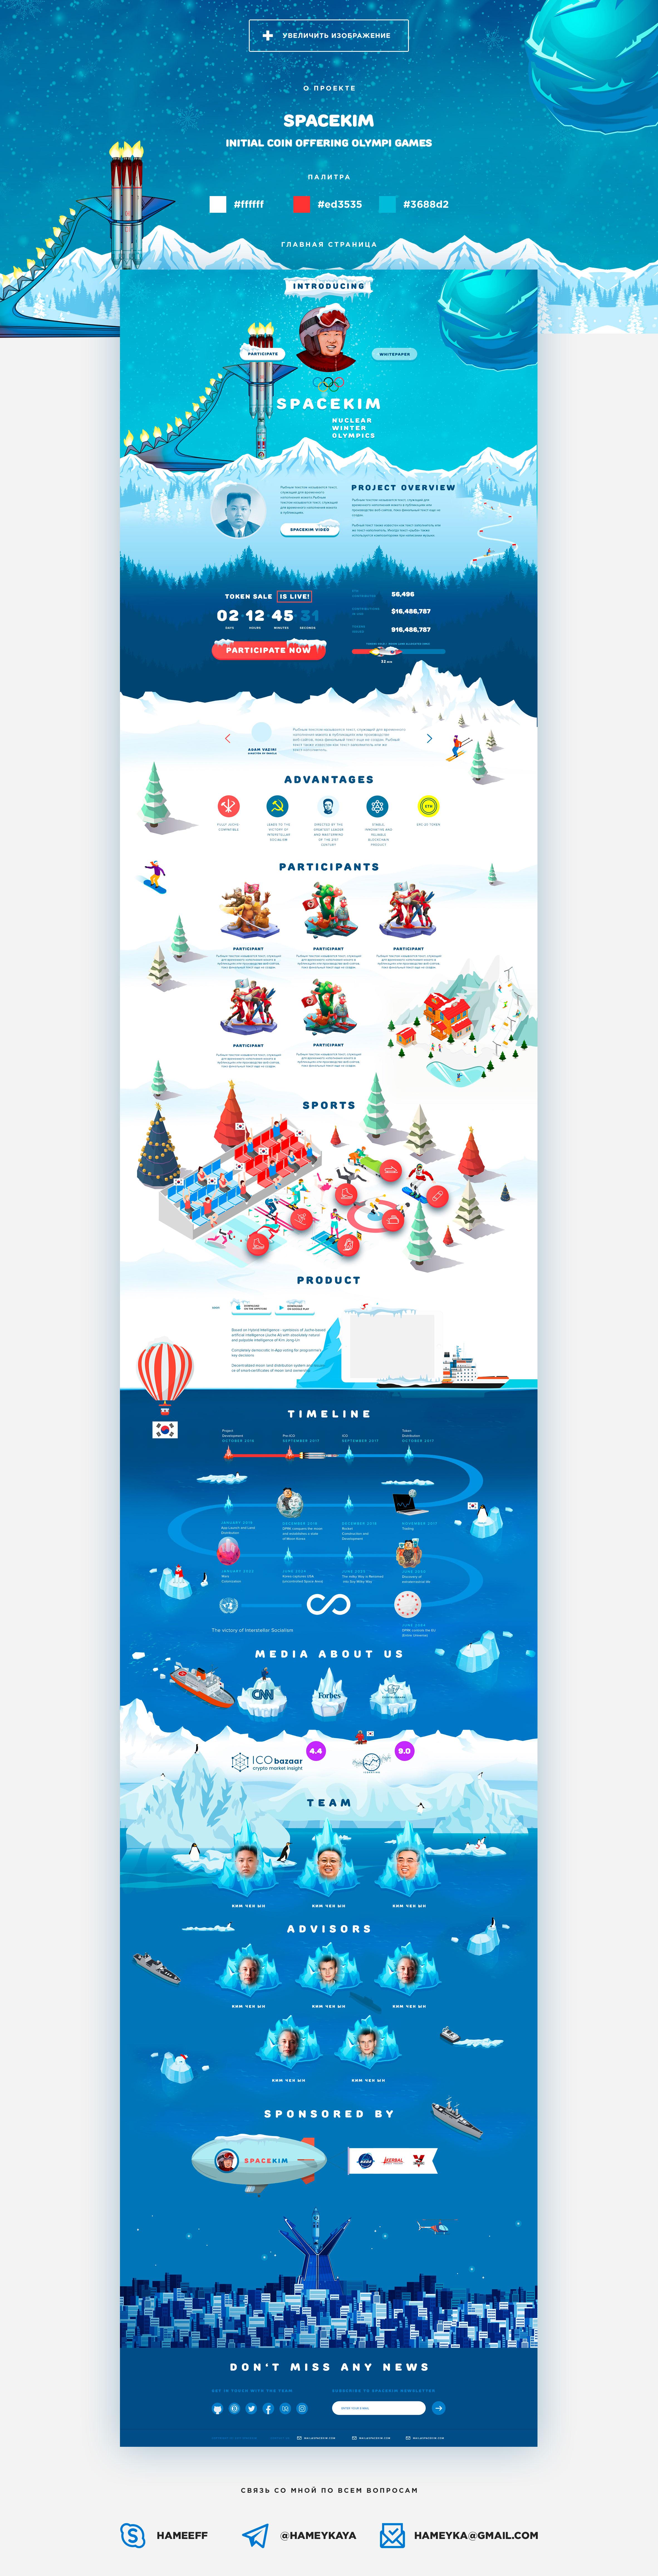 SpaceKim - ICO Korea Olympic Games